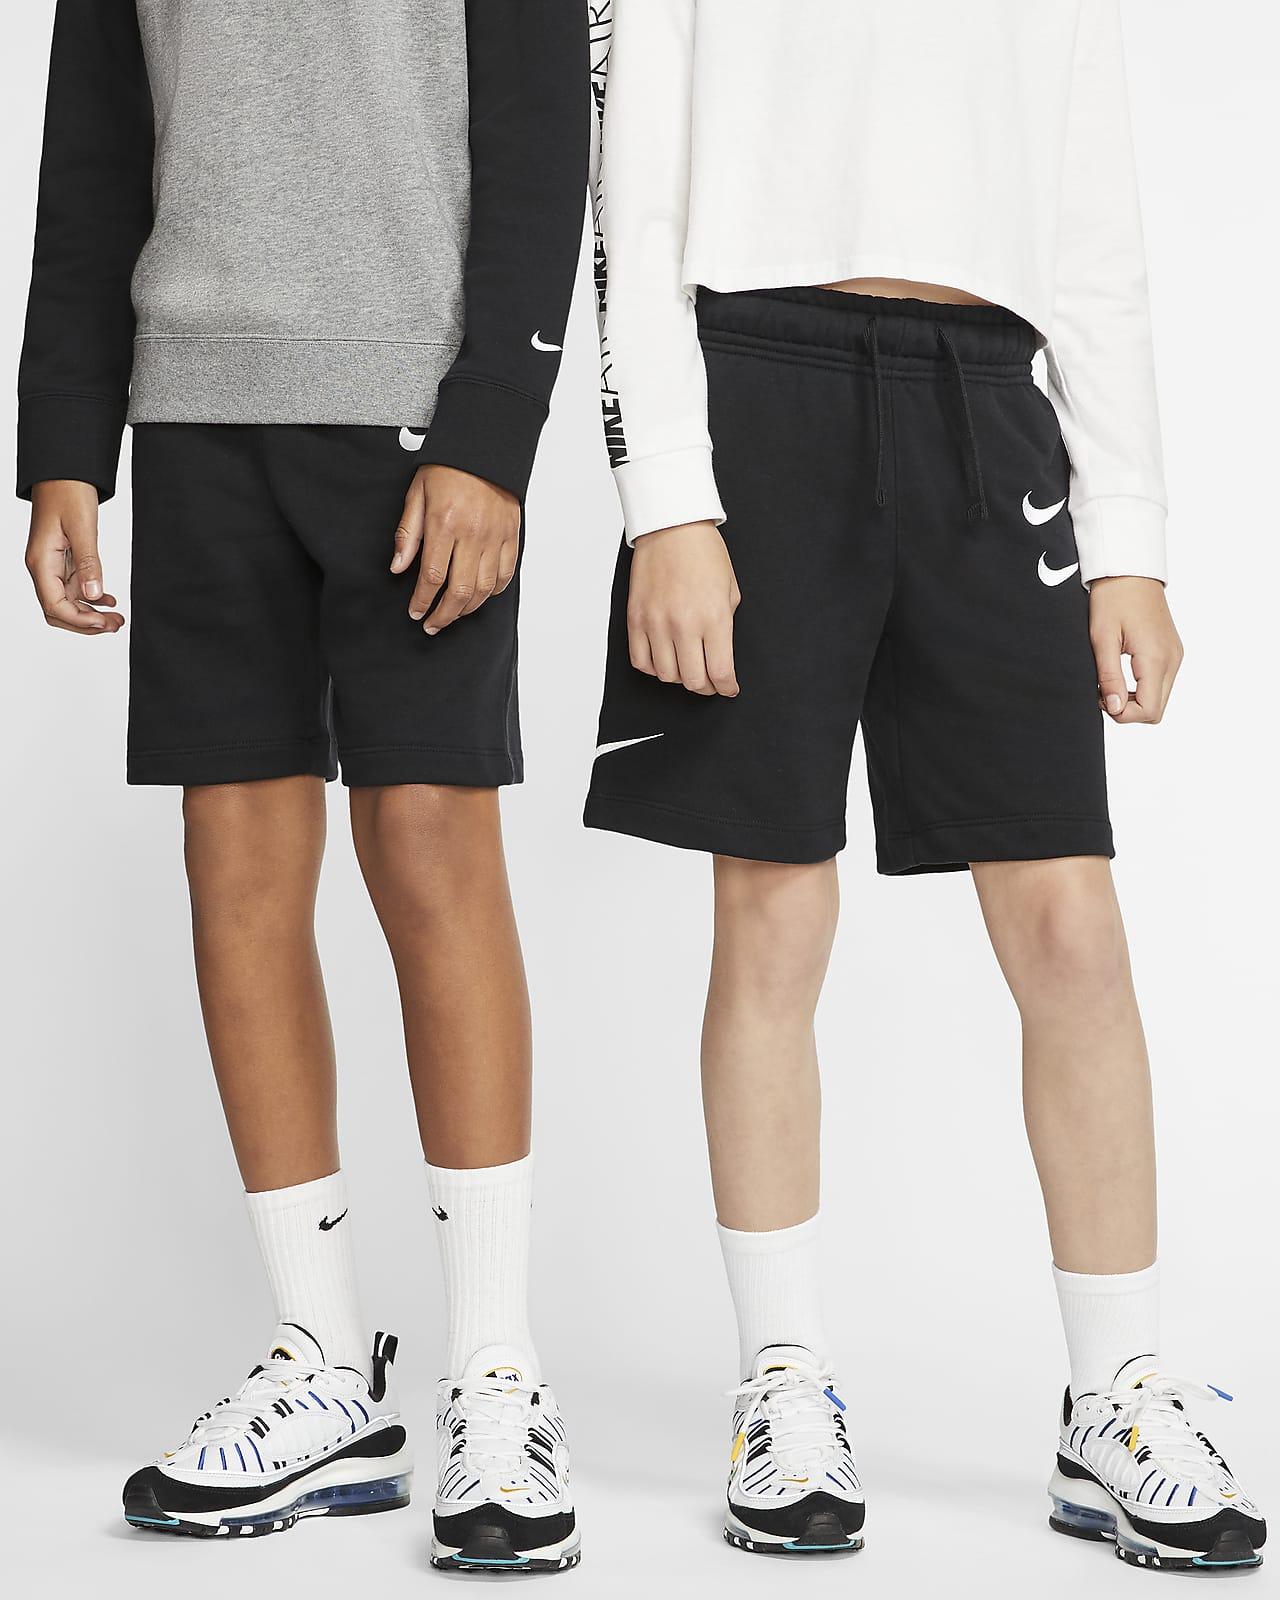 Shorts in French Terry Nike Sportswear - Ragazzi